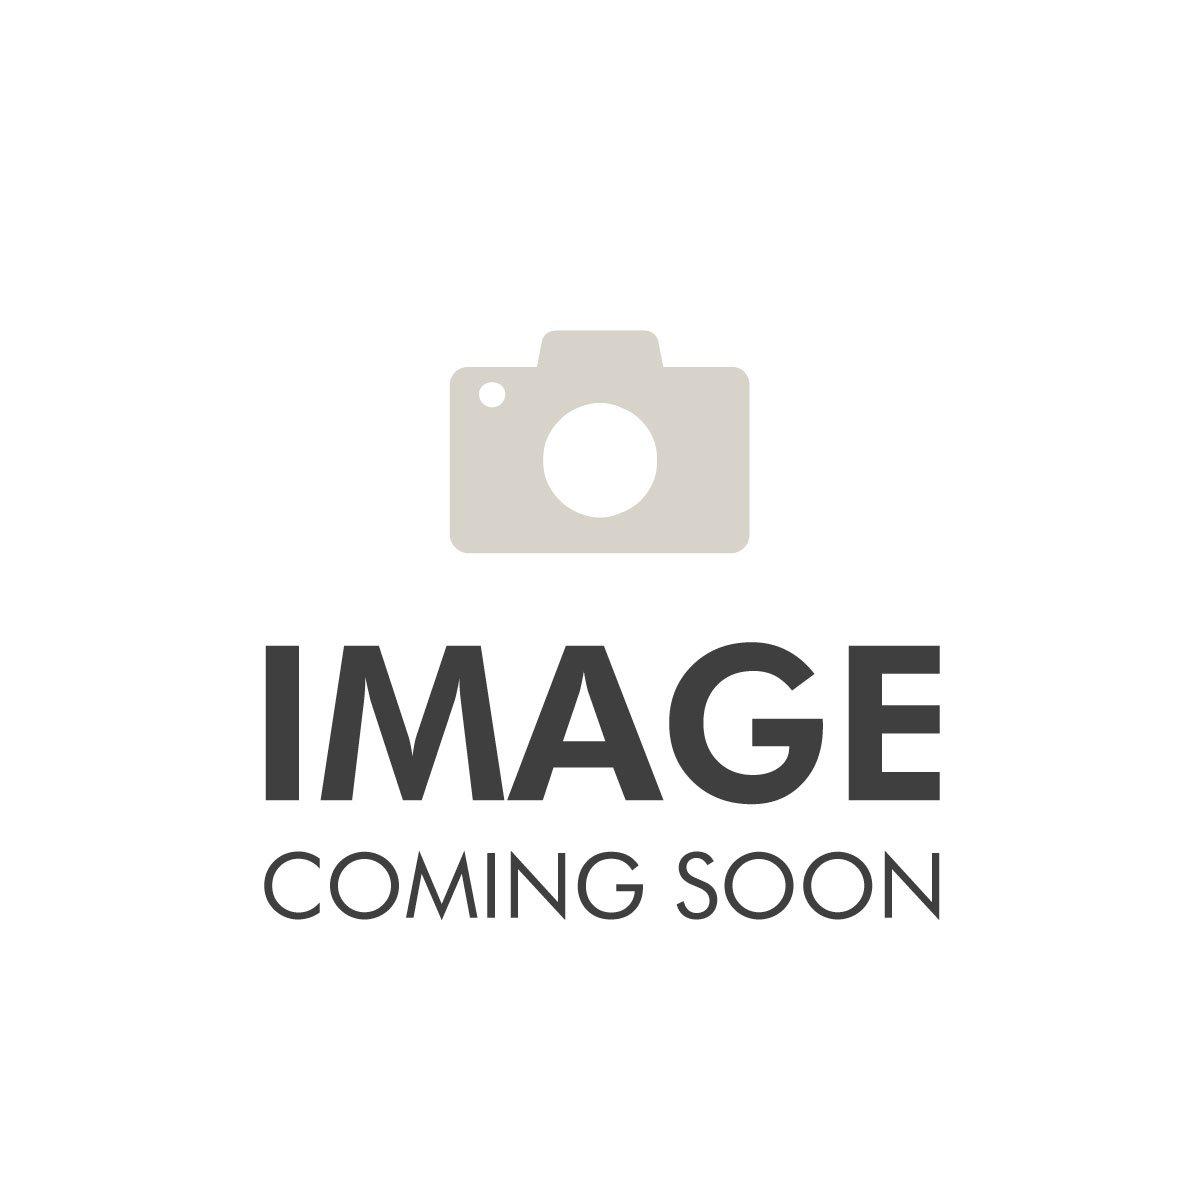 Thierry Mugler Angel 50ml Eau De Parfum (Non-Refillable)